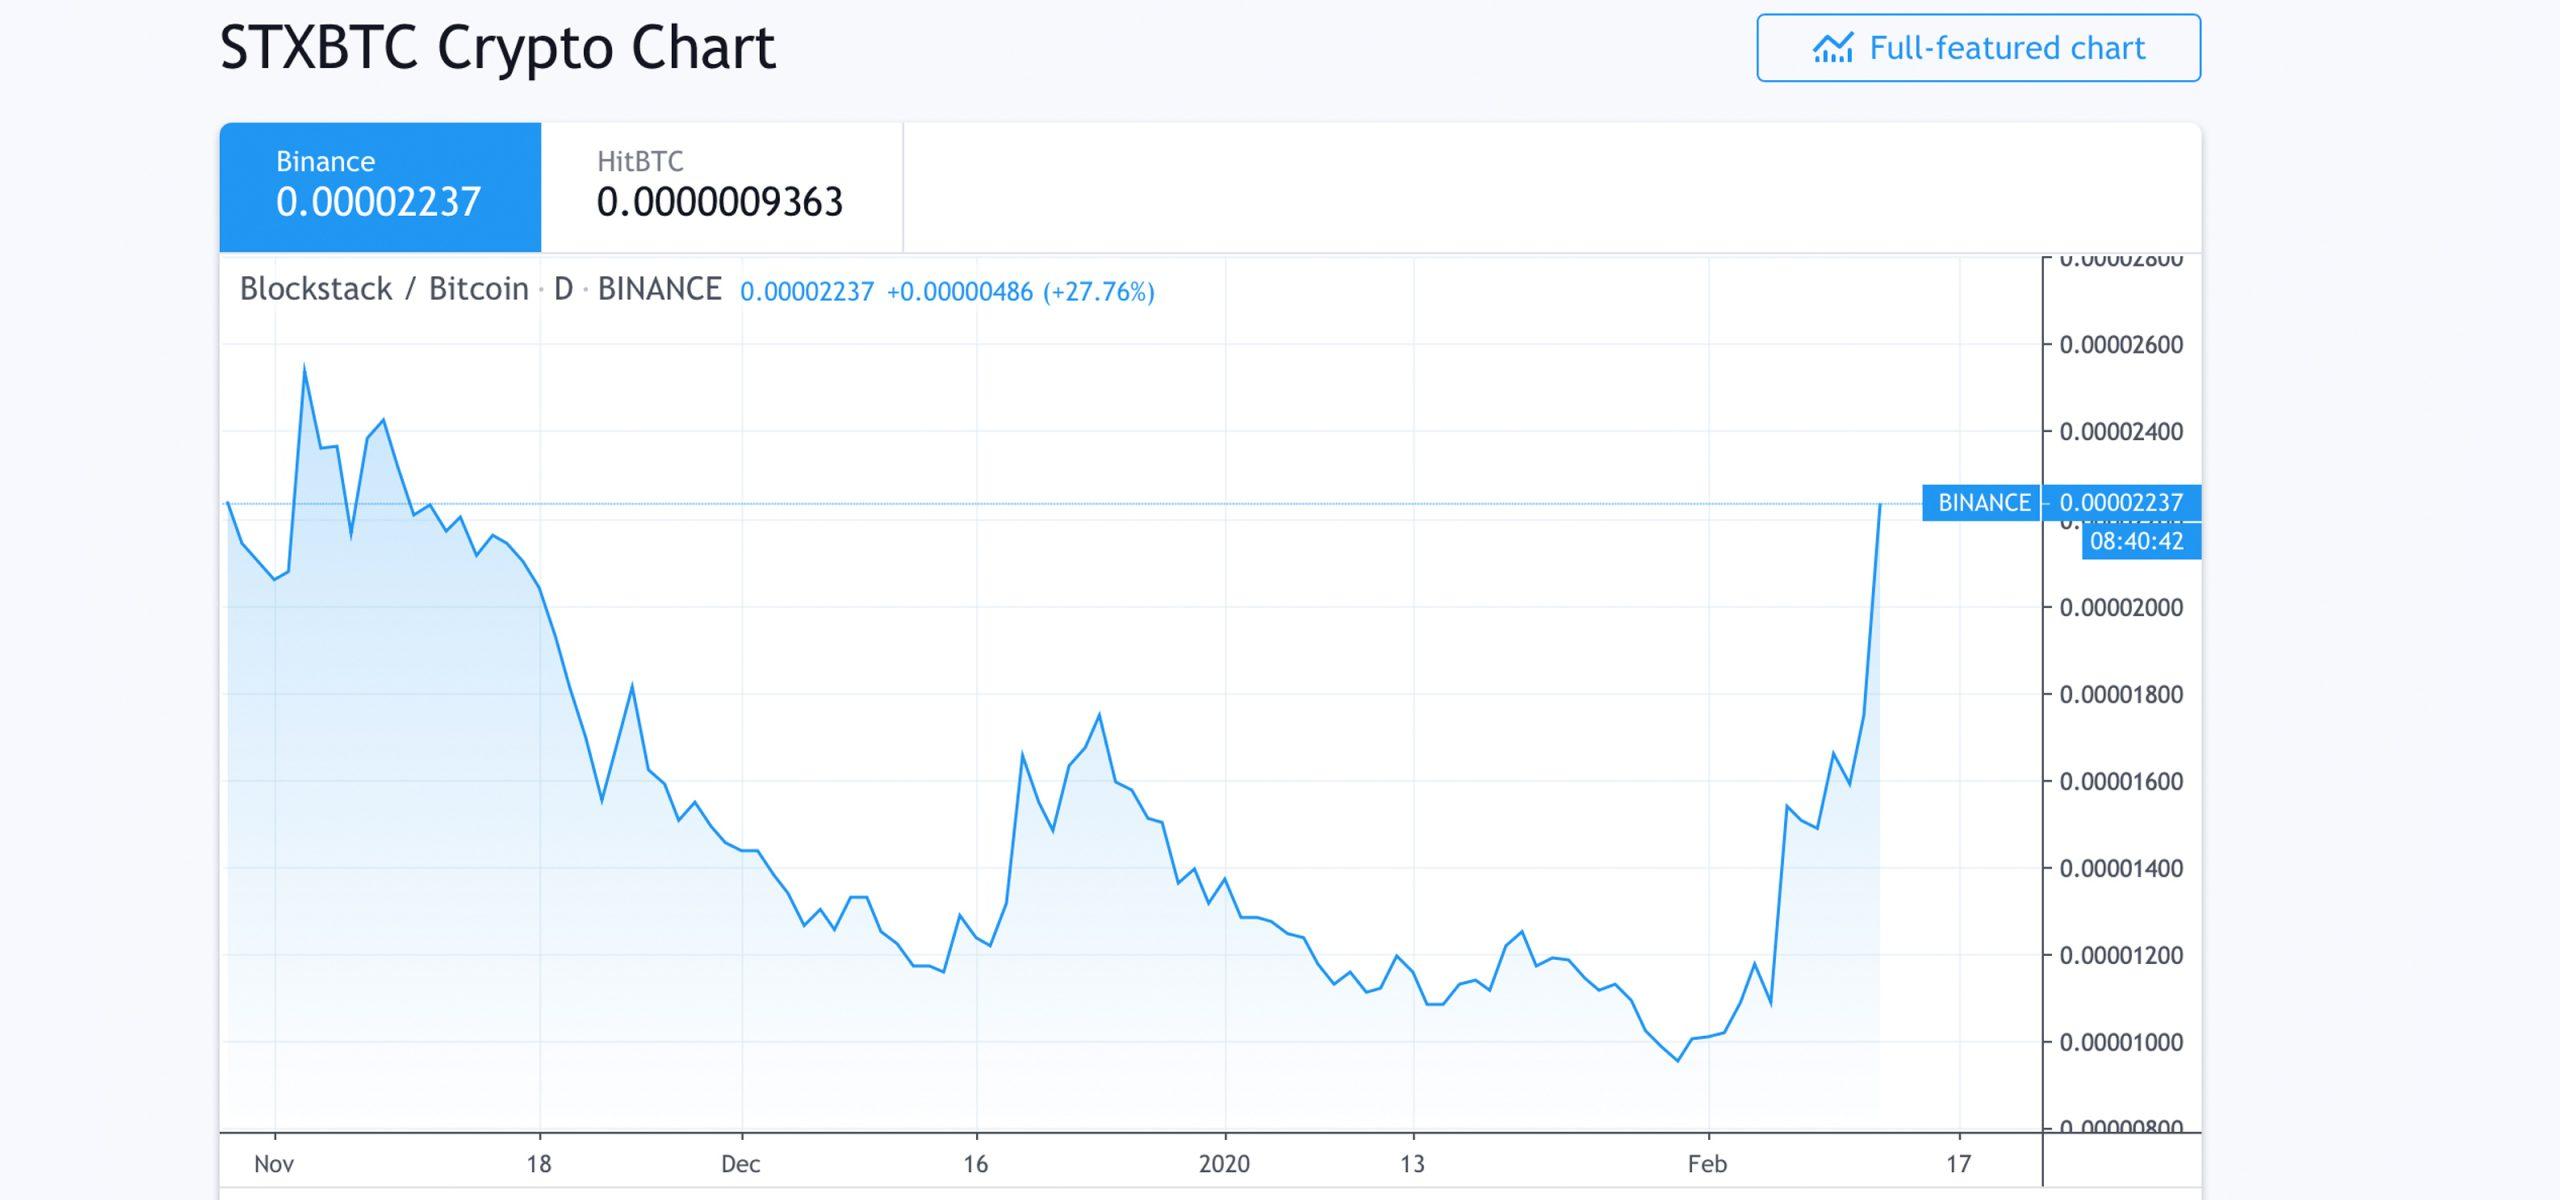 Altcoinシーズン終了–リンク、12か月で700%以上のXTZヒートアップ